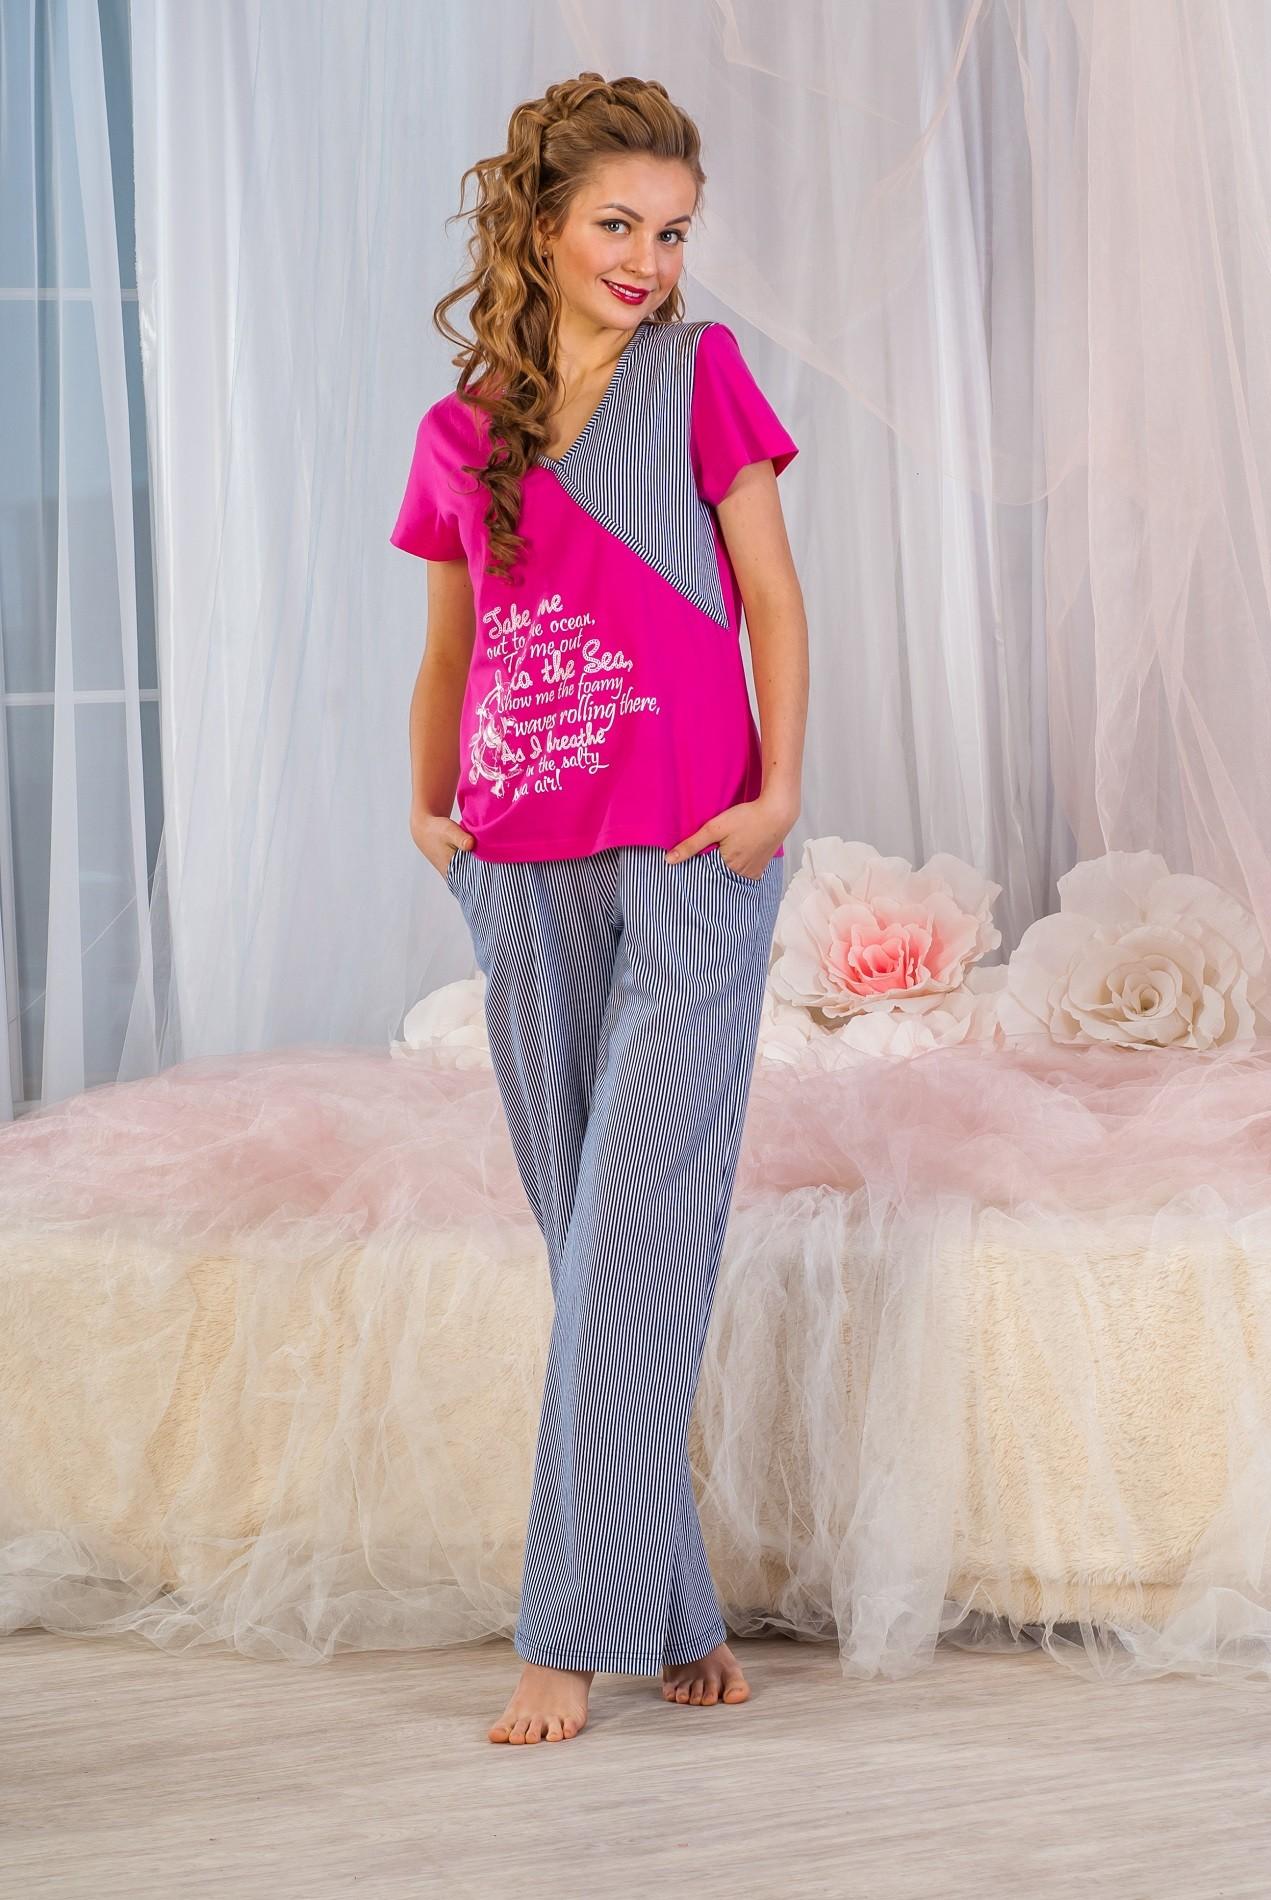 Костюм женский Шторм футболка и брюкиКостюмы<br><br><br>Размер: 52